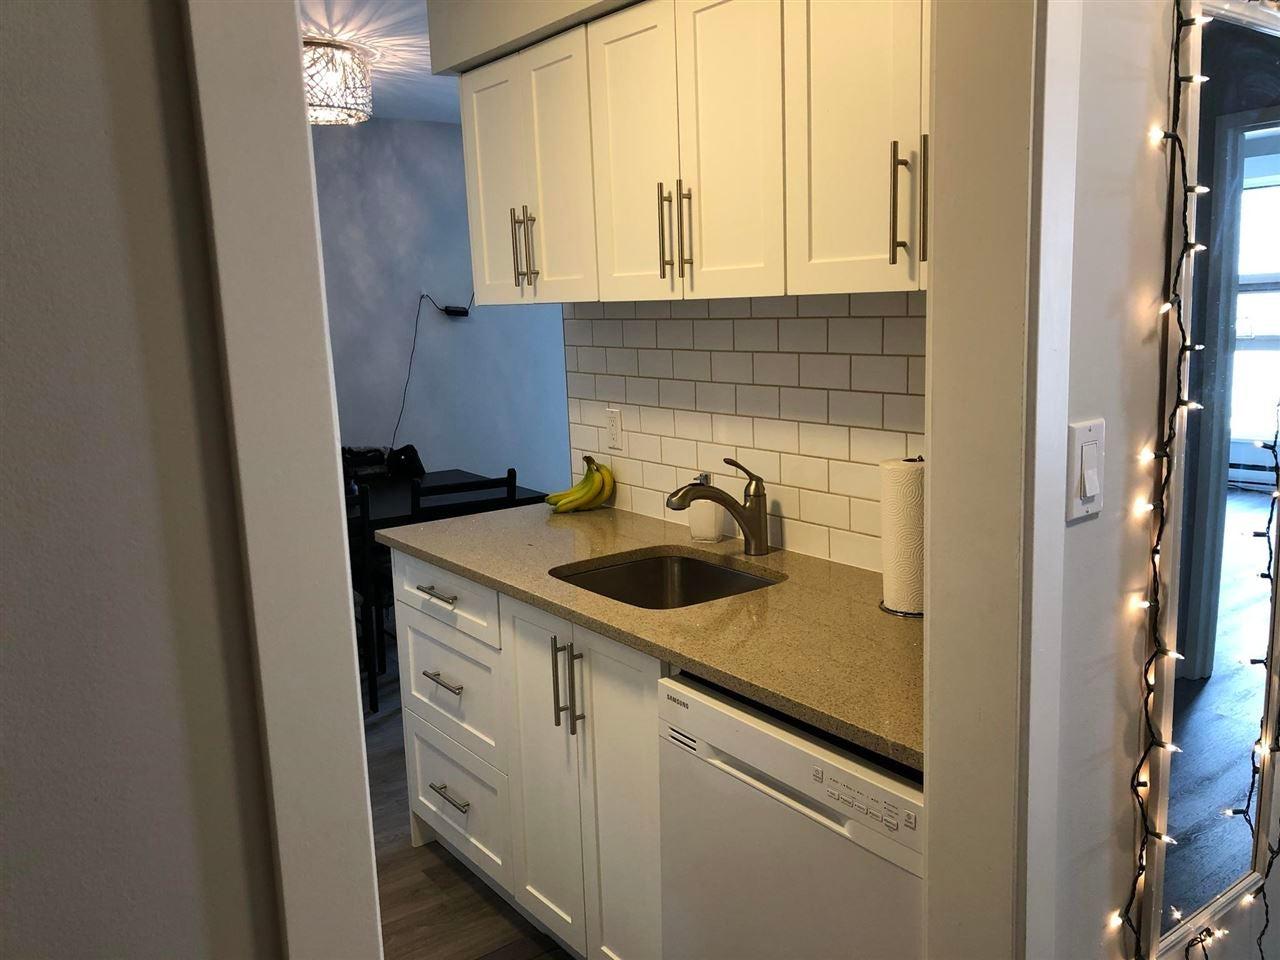 304 15238 100 AVENUE - Guildford Apartment/Condo for sale, 1 Bedroom (R2576105) - #10